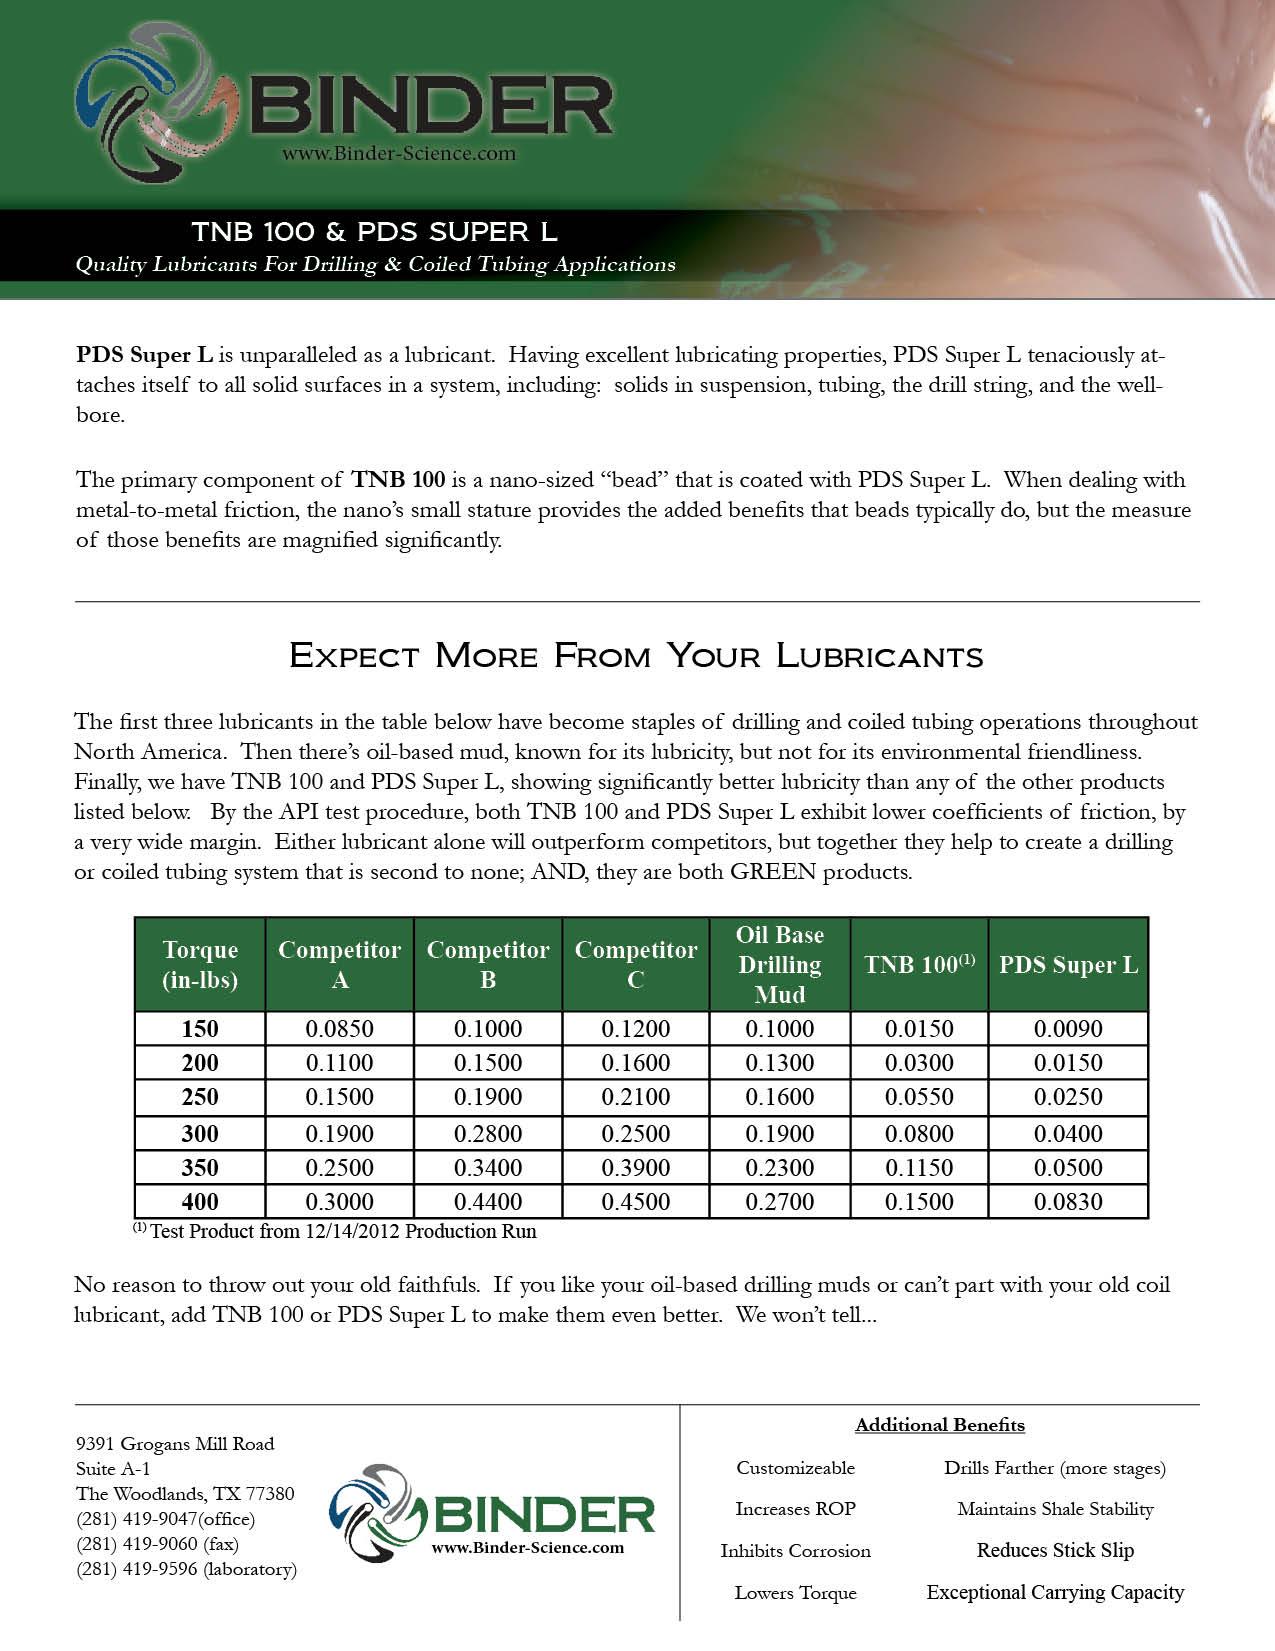 Binder Lubricant Intro